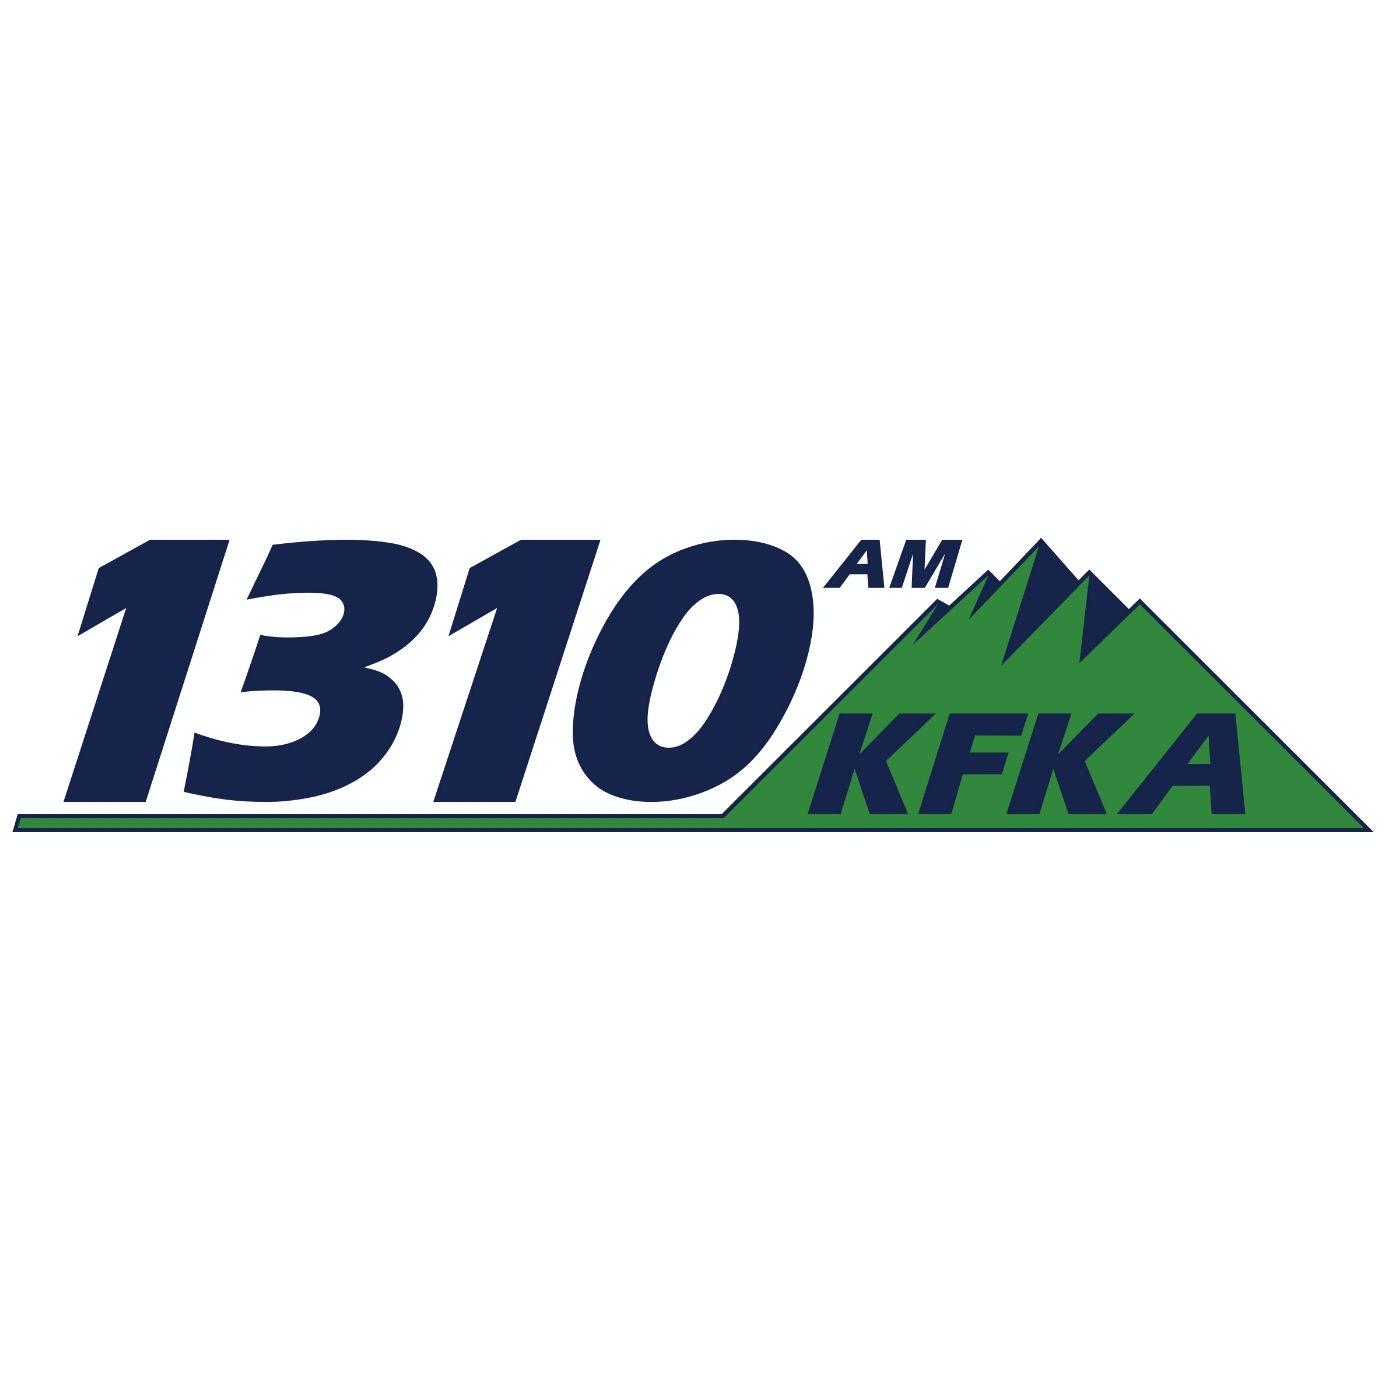 UNC Podcasts – 1310 KFKA